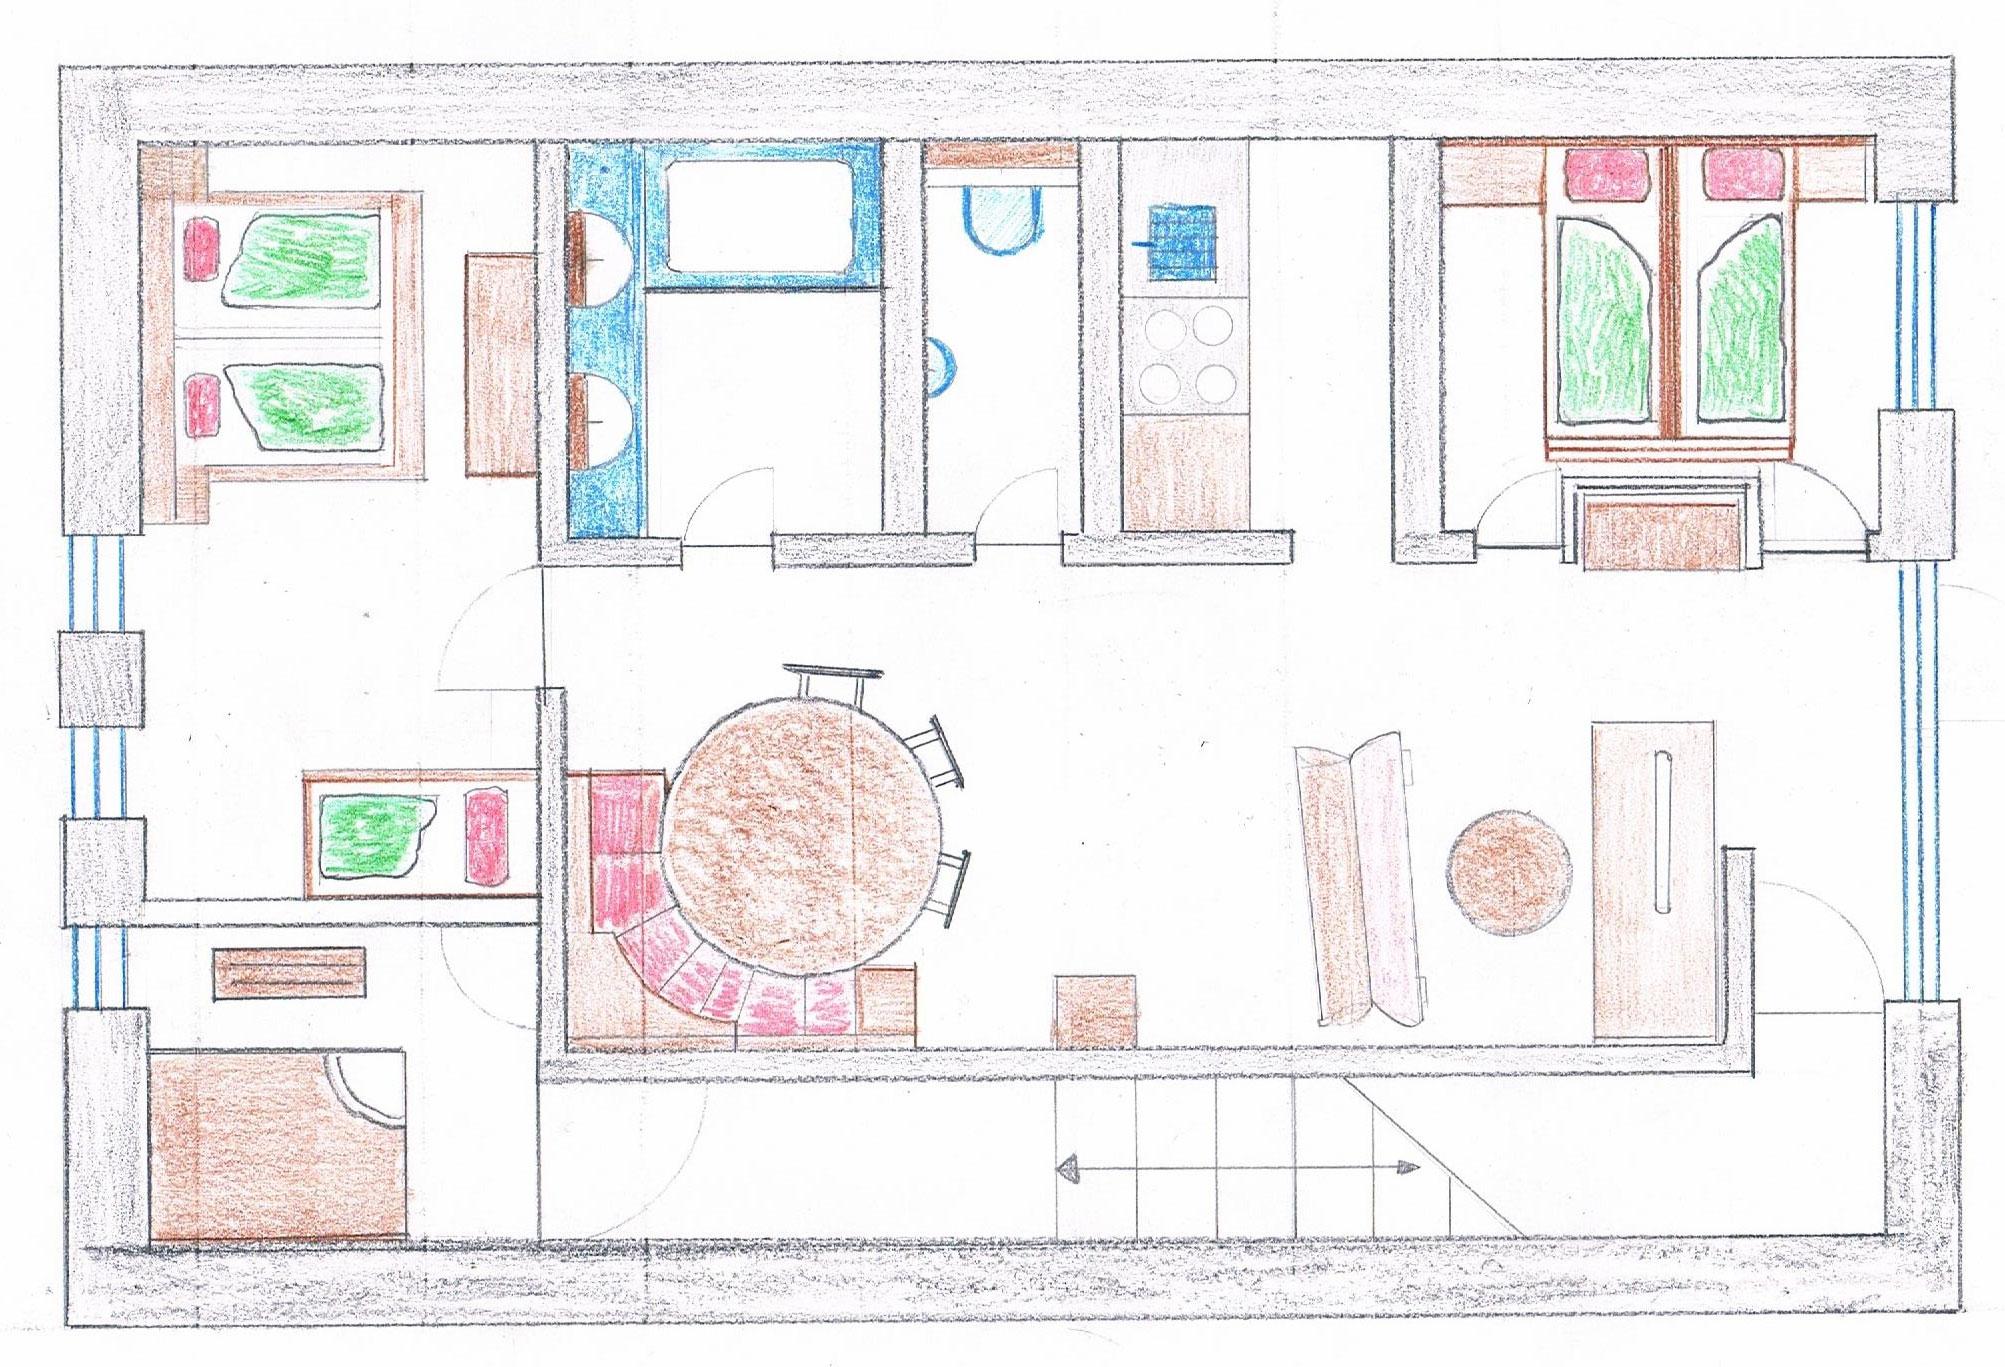 ferienwohnung f r 2 bis 7 personen im haus fabian in obergurgl familienurlaub in obergurgl. Black Bedroom Furniture Sets. Home Design Ideas